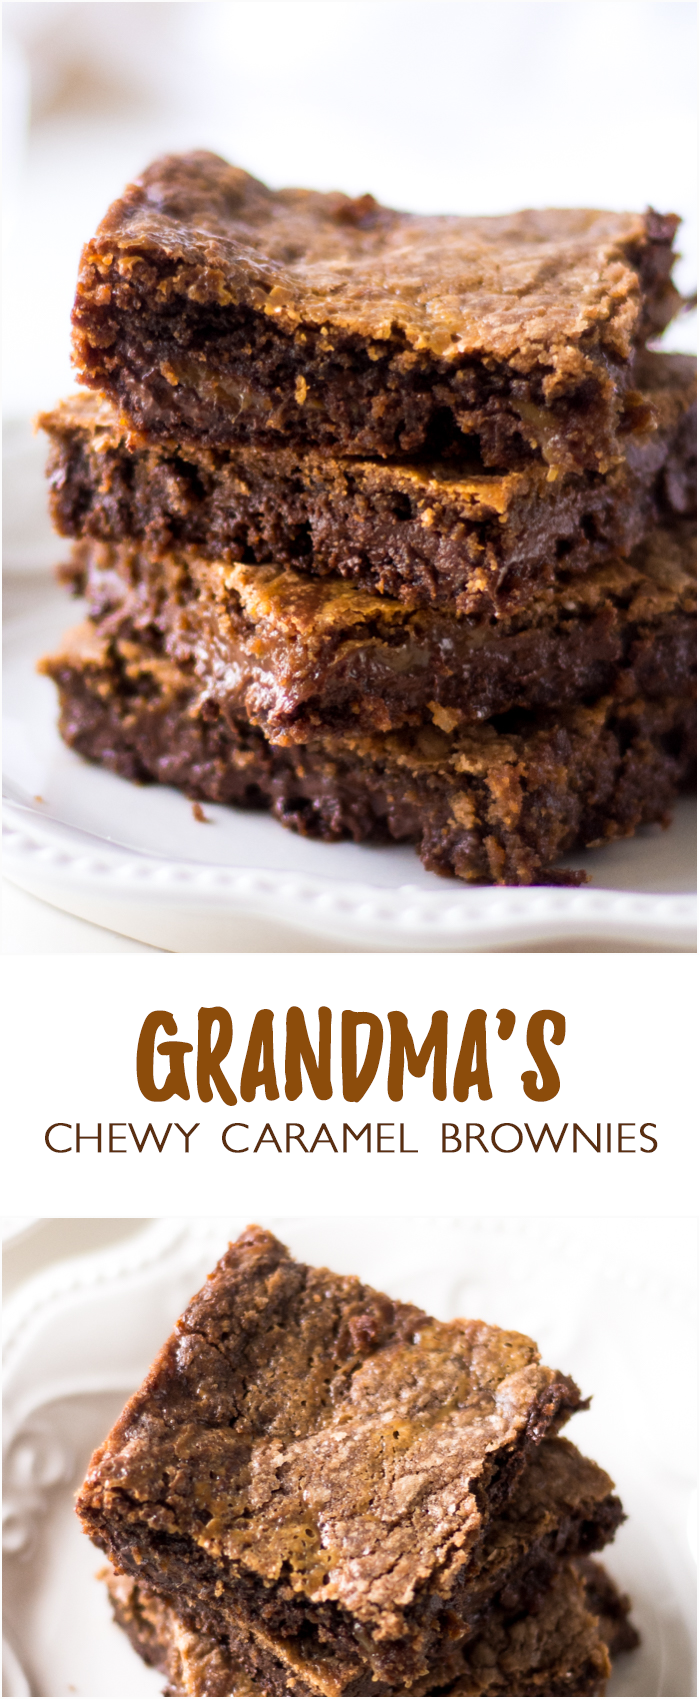 Grandma's Chewy Caramel Brownies | Recipe | Chocolate cake mixes ...